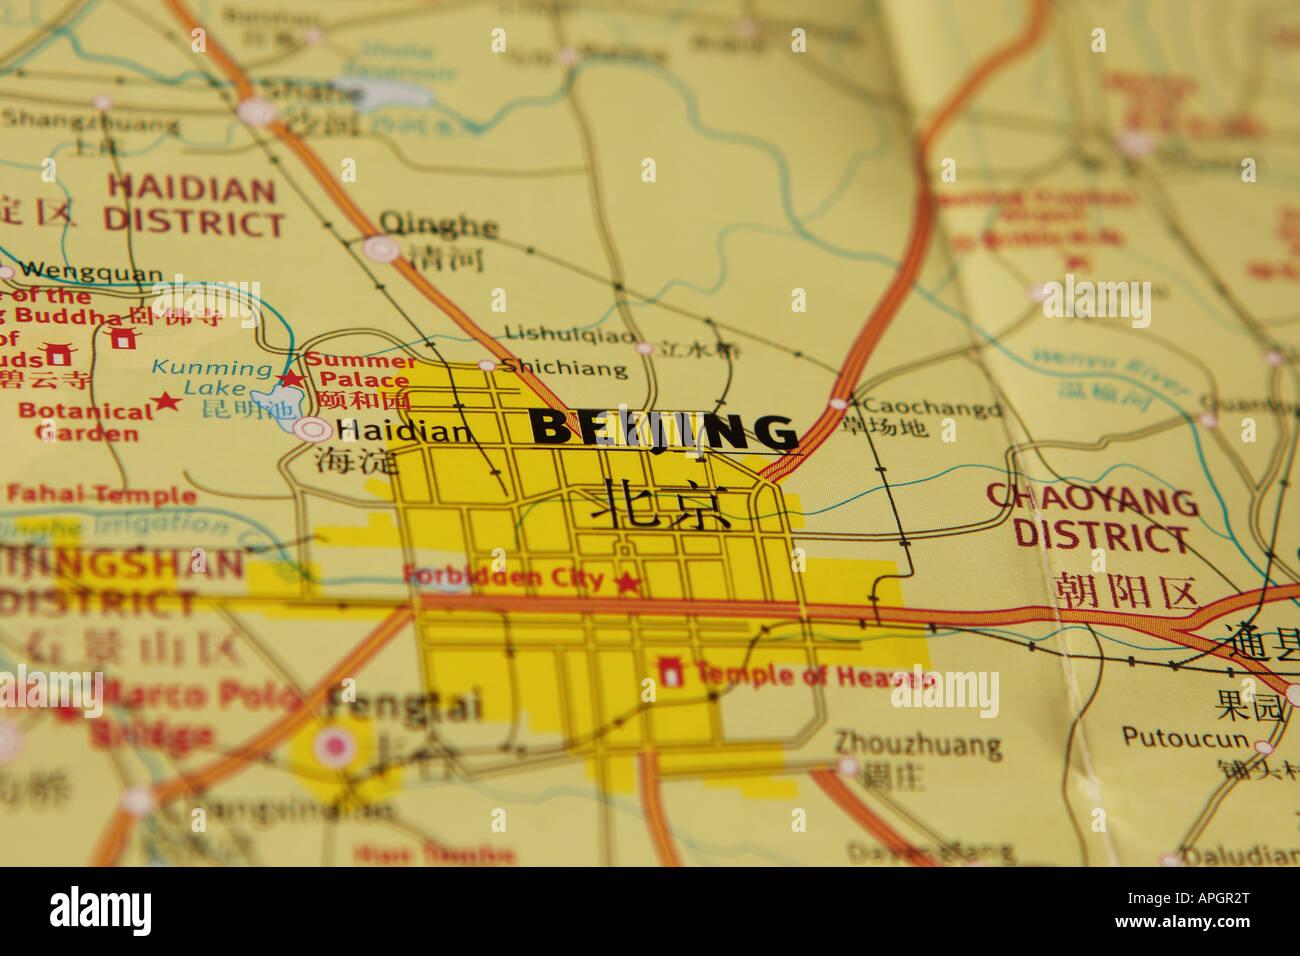 Beijing Map Stock Photos Beijing Map Stock Images Alamy